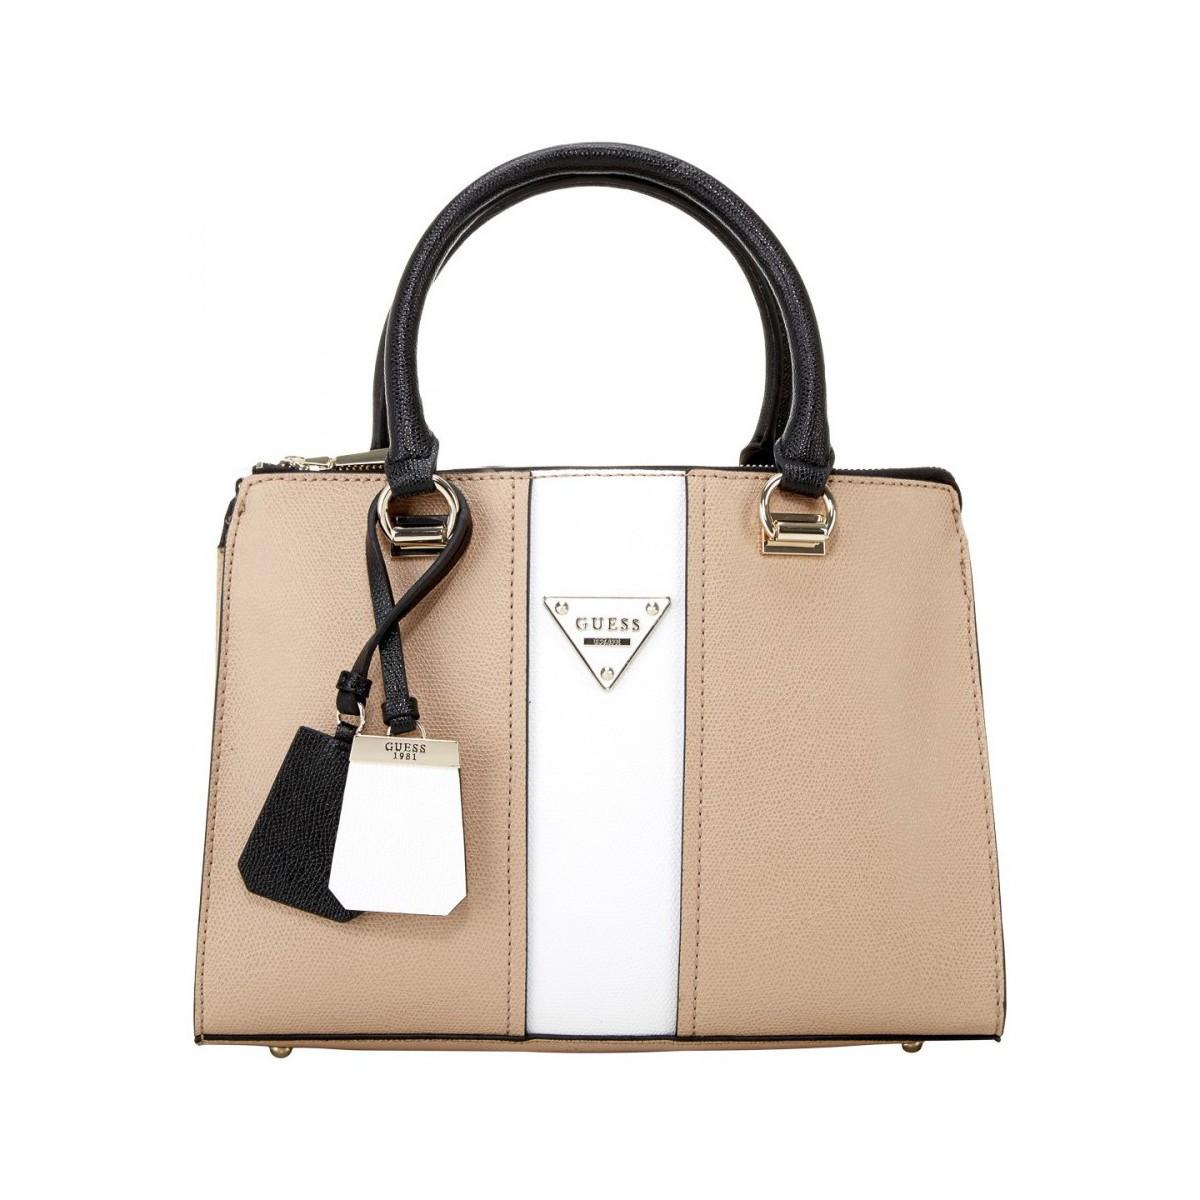 boutique sac guess